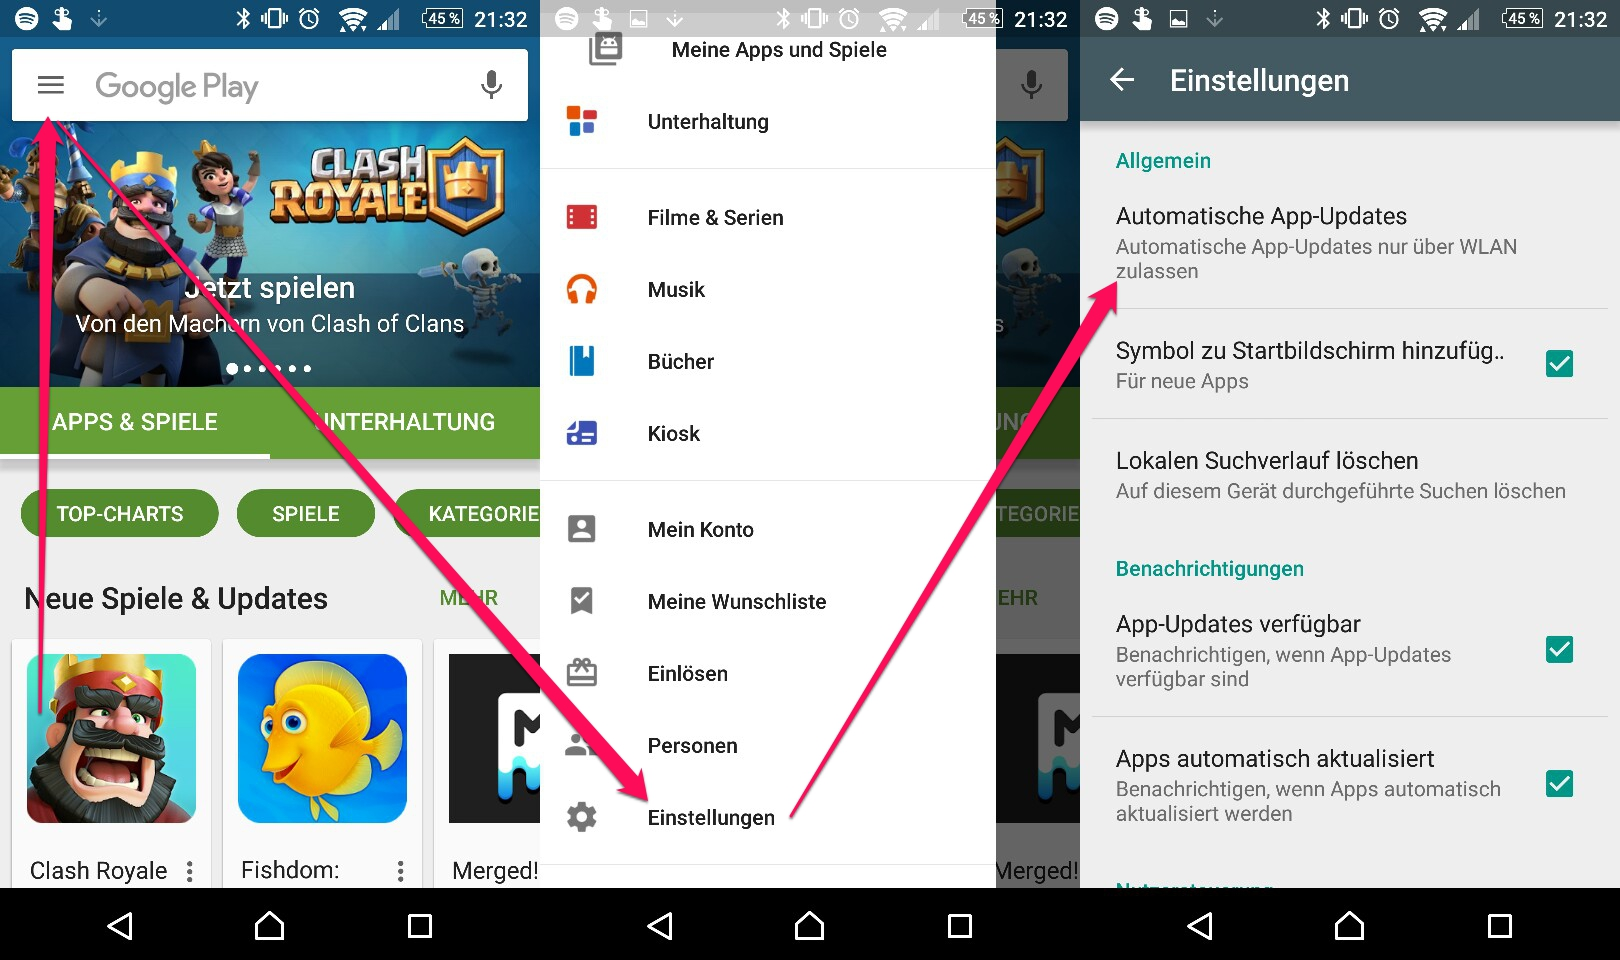 Google Play Store - Automatische App-Updates deaktivieren